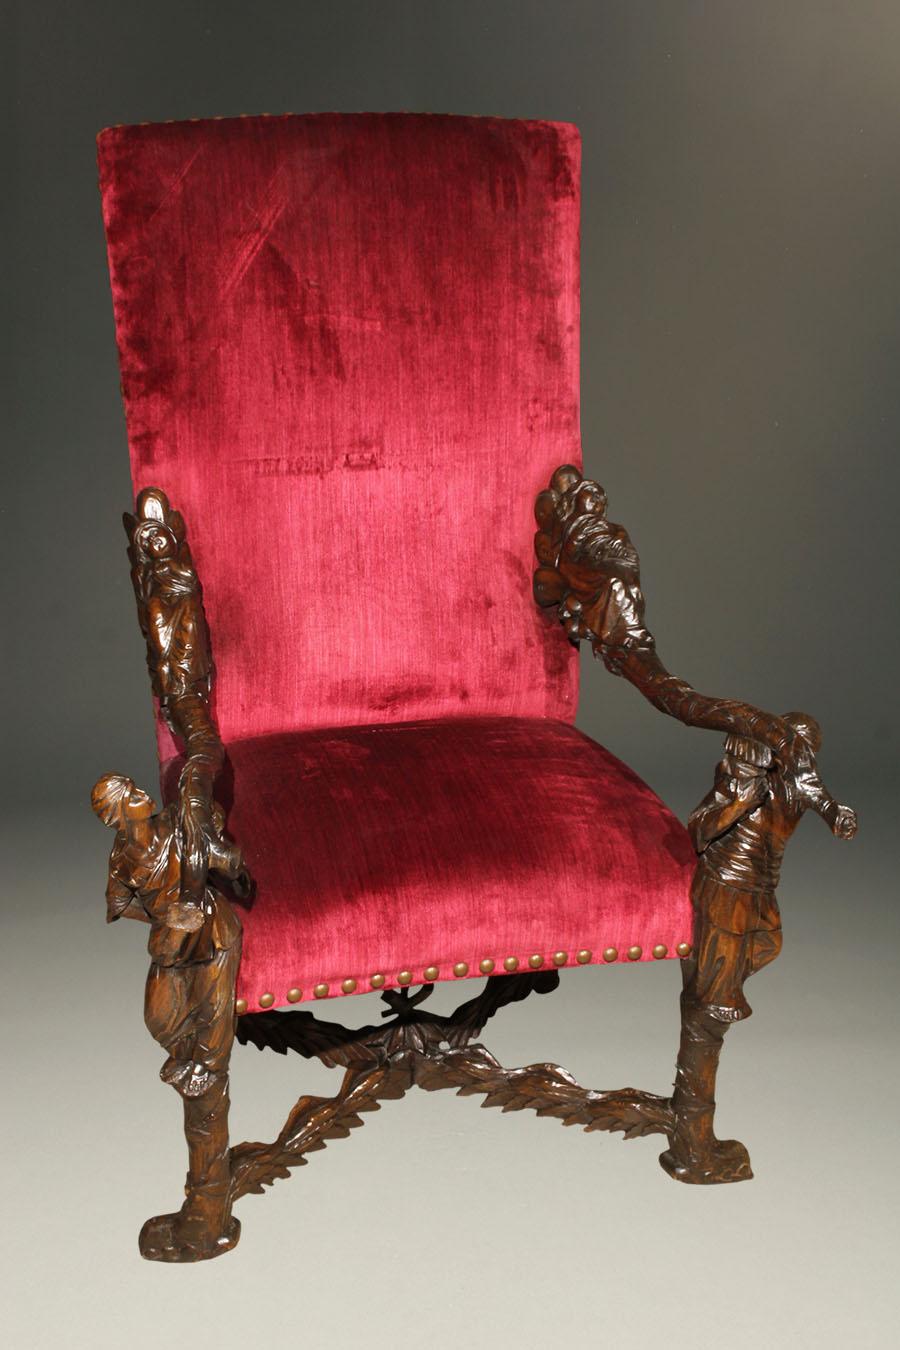 A5640A-antique-carved-chair-arm-venetian - Antique Hand Carved Venetian Armchair.